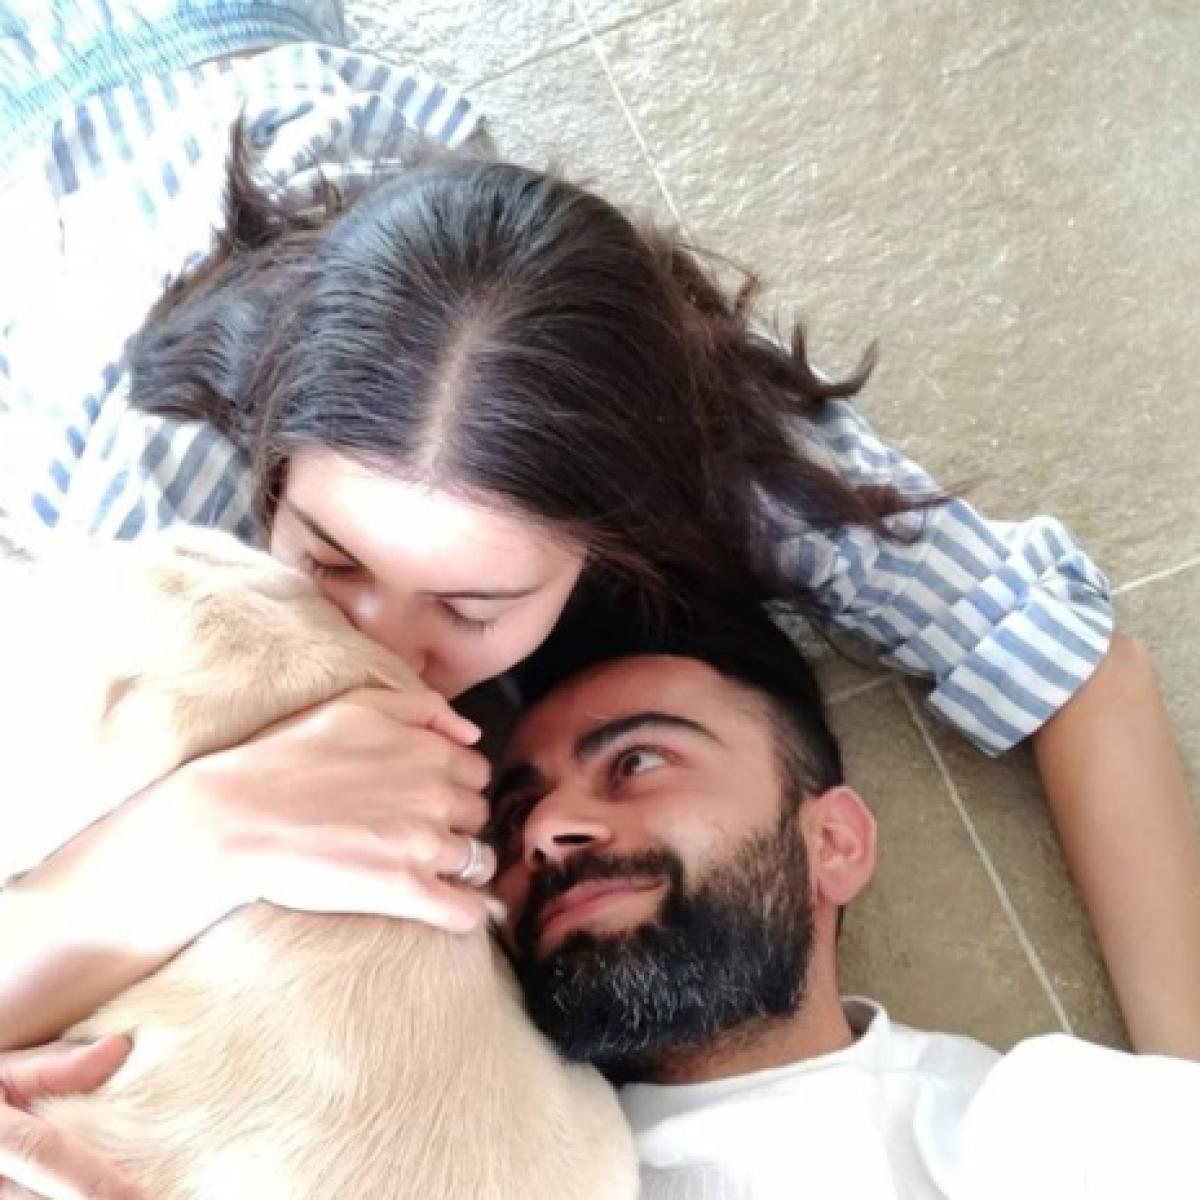 'The way he looks at her': Anushka Sharma, Virat Kohli's adorable pic is making the internet feel lovesick!